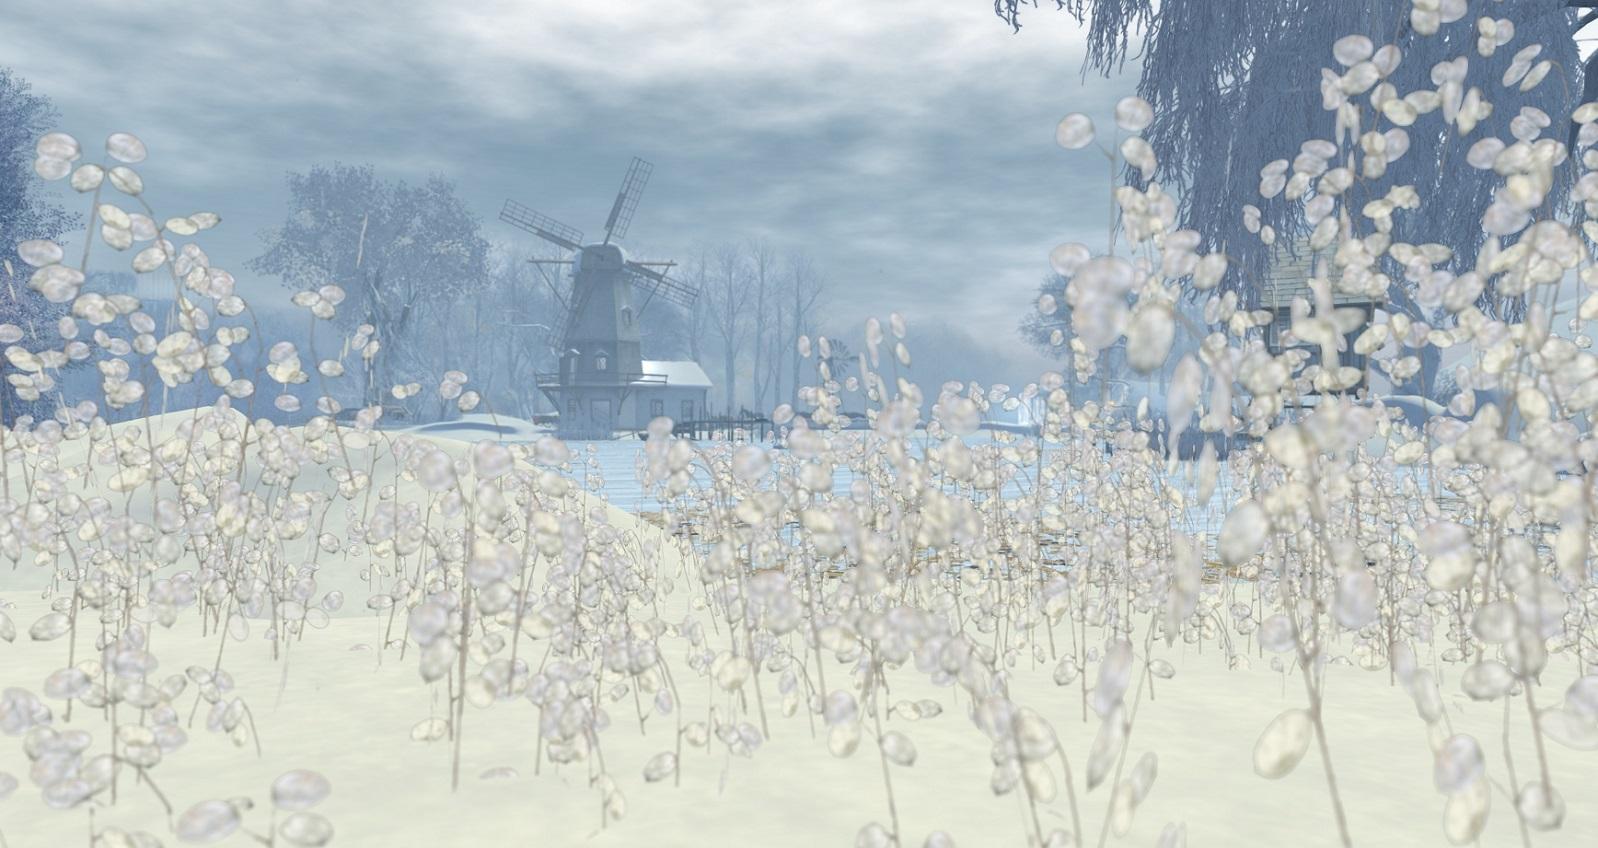 Luanes World's winter